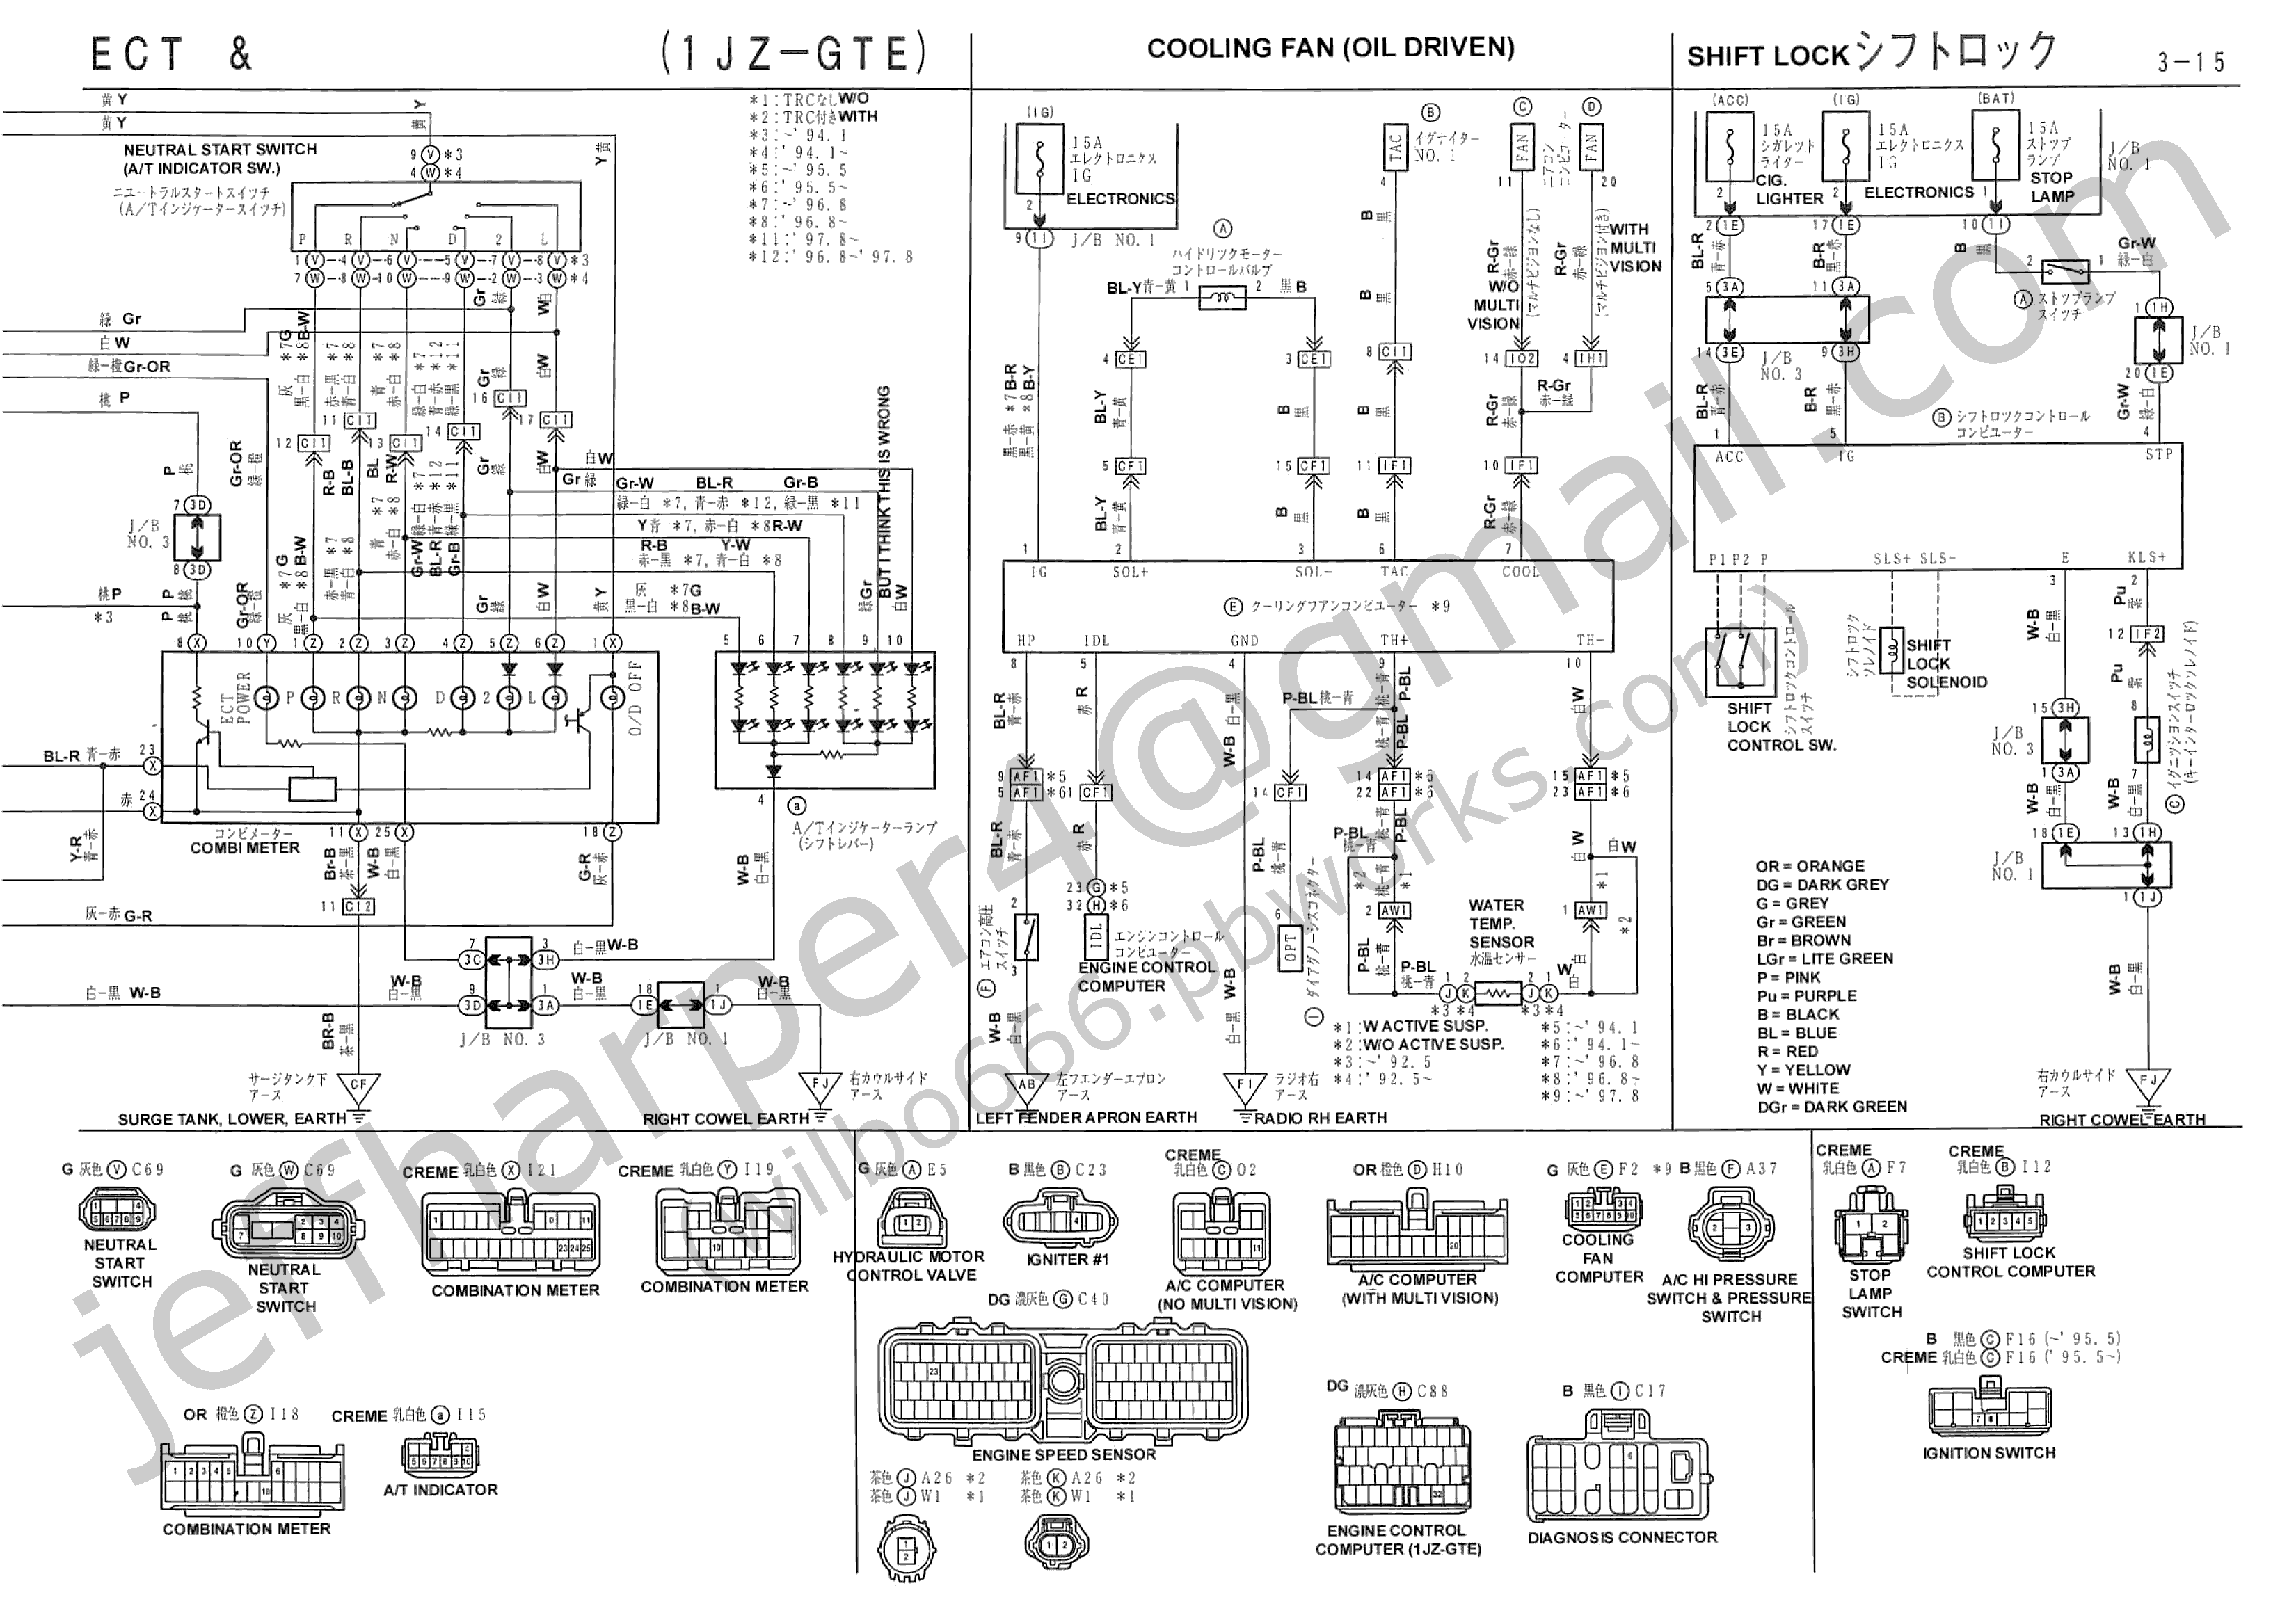 wilbo666 1jz gte jzz30 soarer engine wiring 1jz wiring diagram pdf 1jz wiring diagram #3